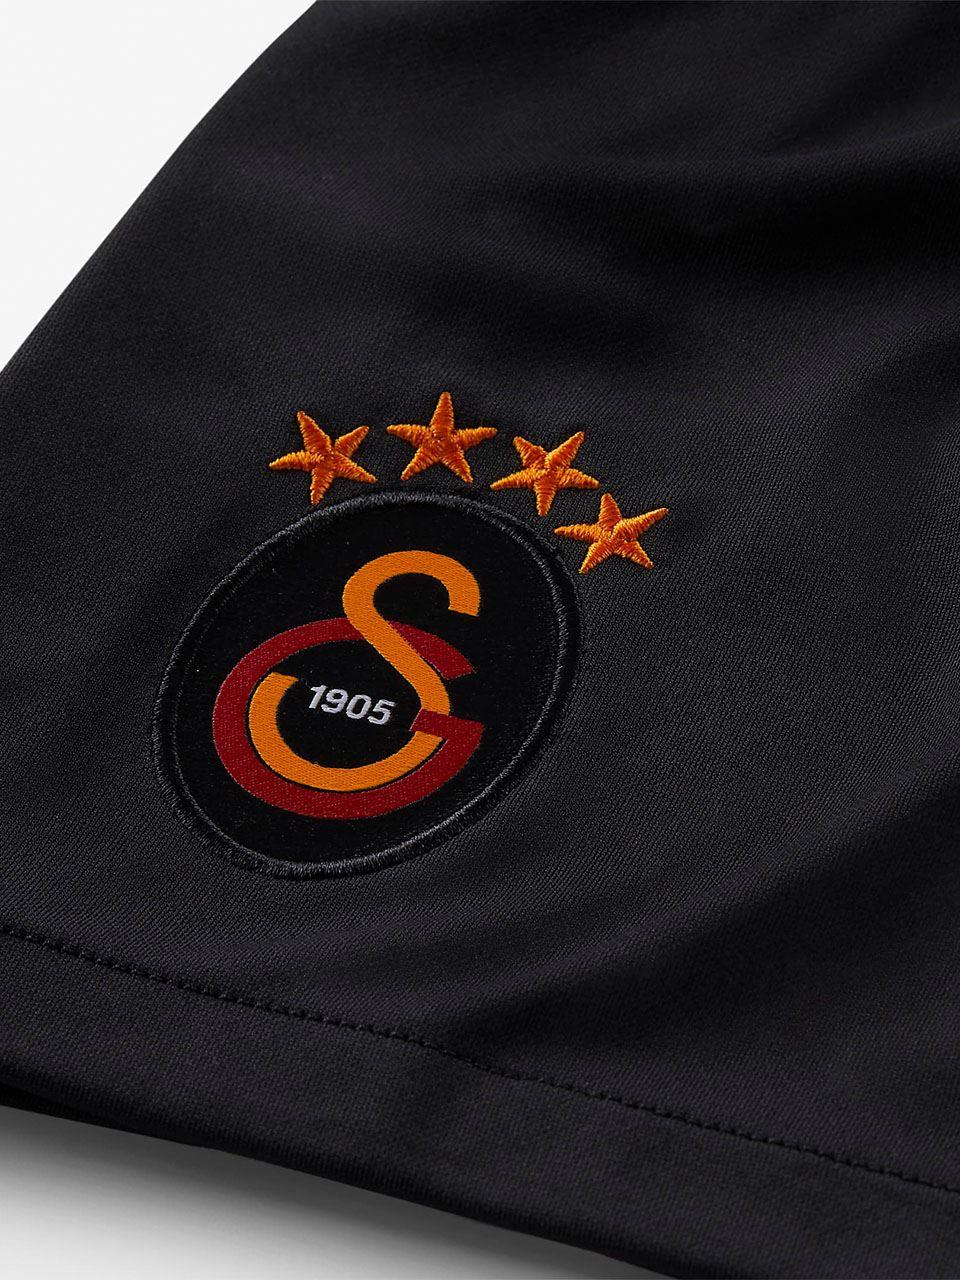 Nike Galatasaray Çocuk İç/Dış Saha  Futbol Şort CV8323-010